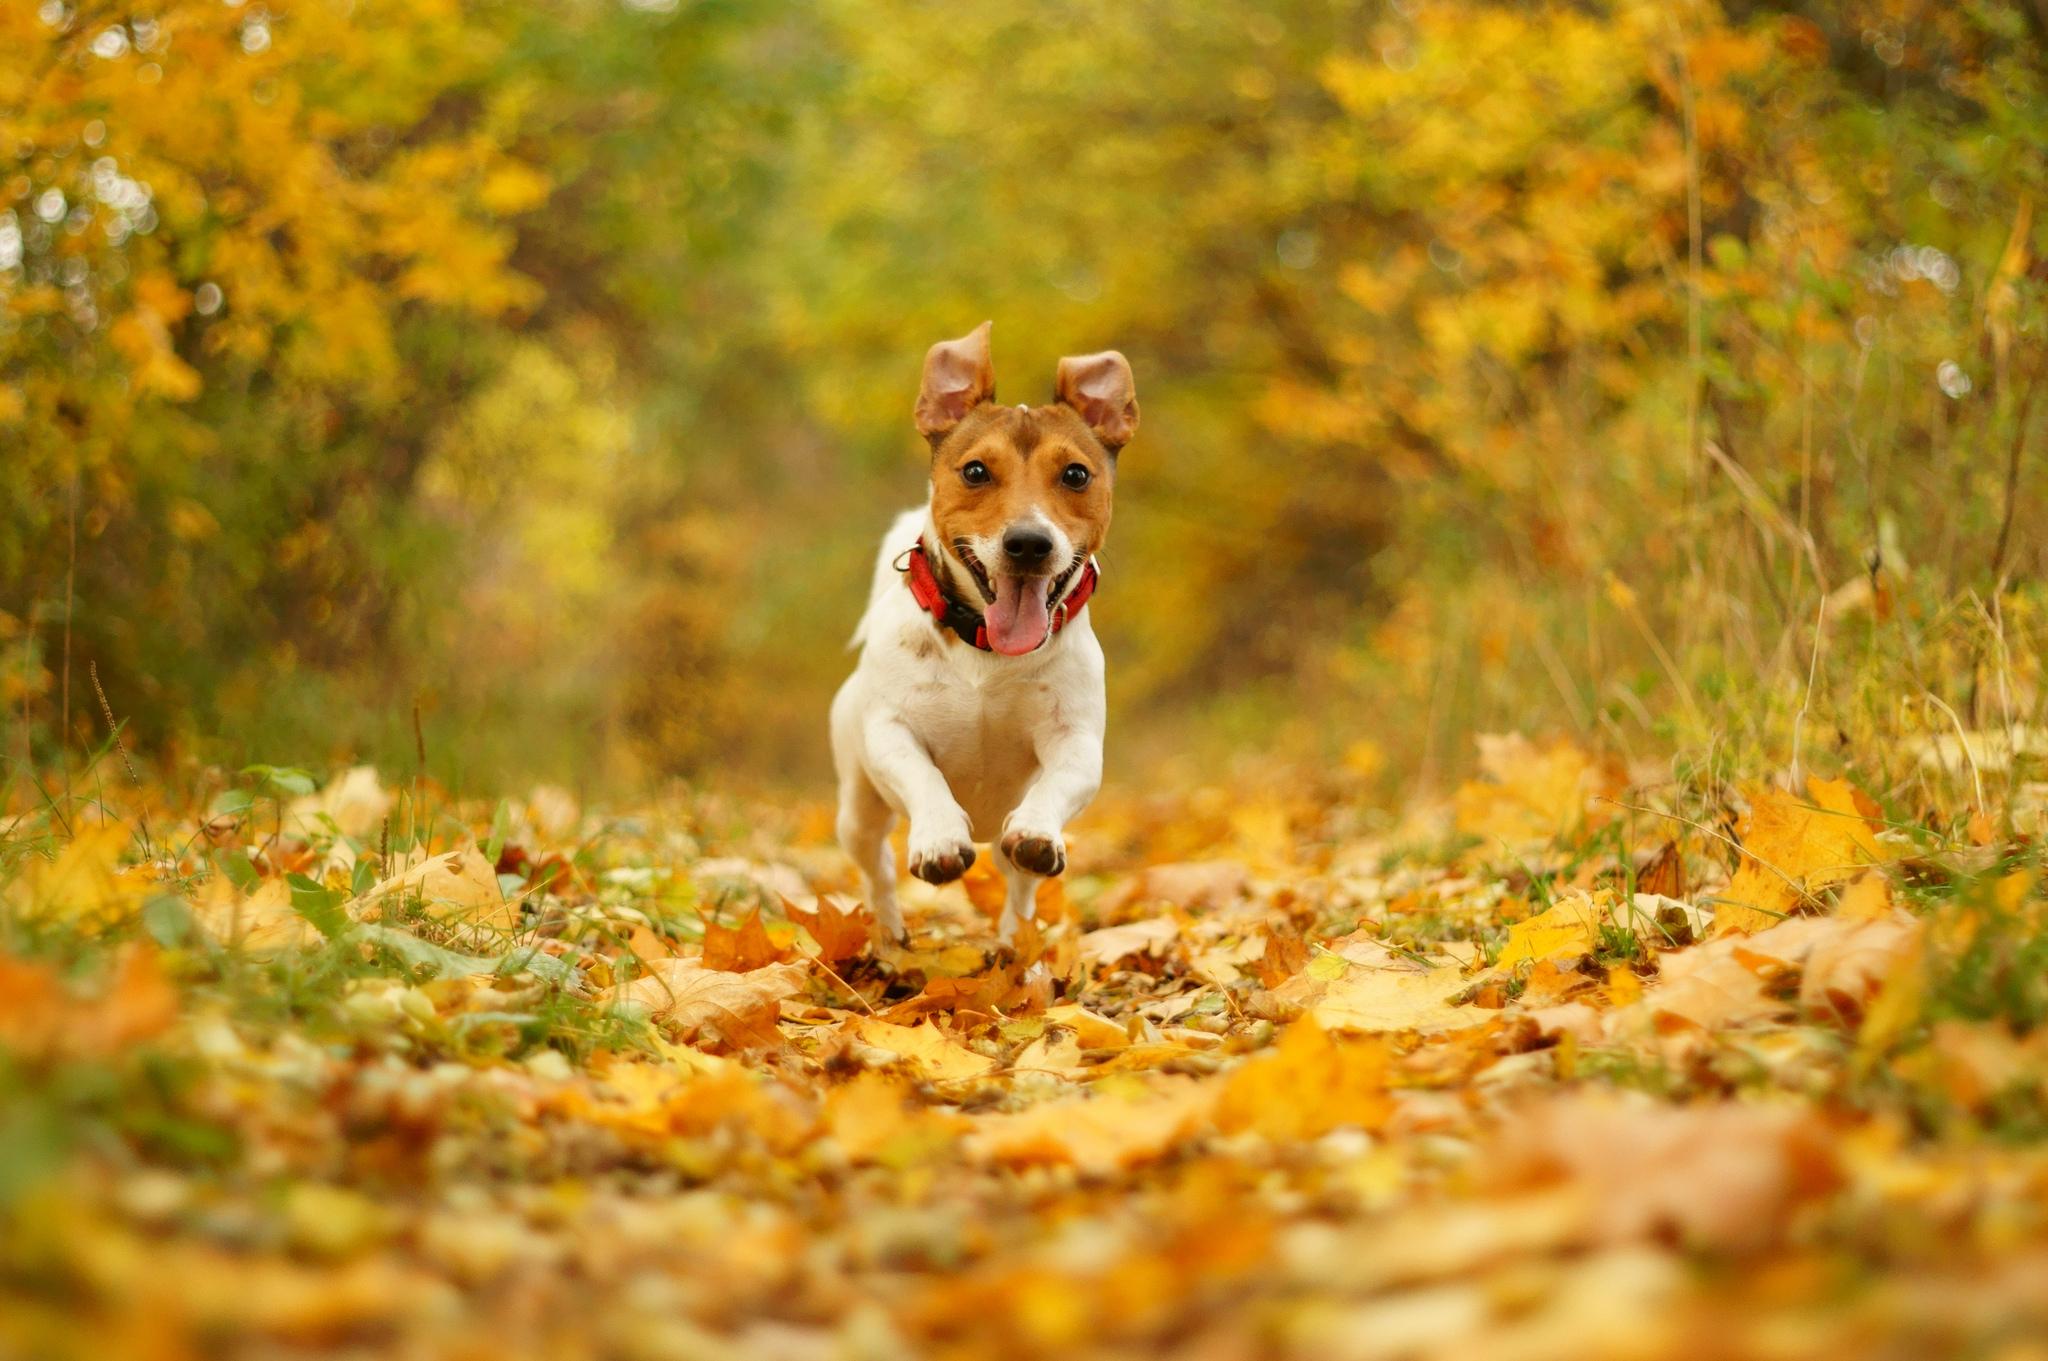 Wallpaper dog running speed joy mouth nature autumn foliage 2048x1361